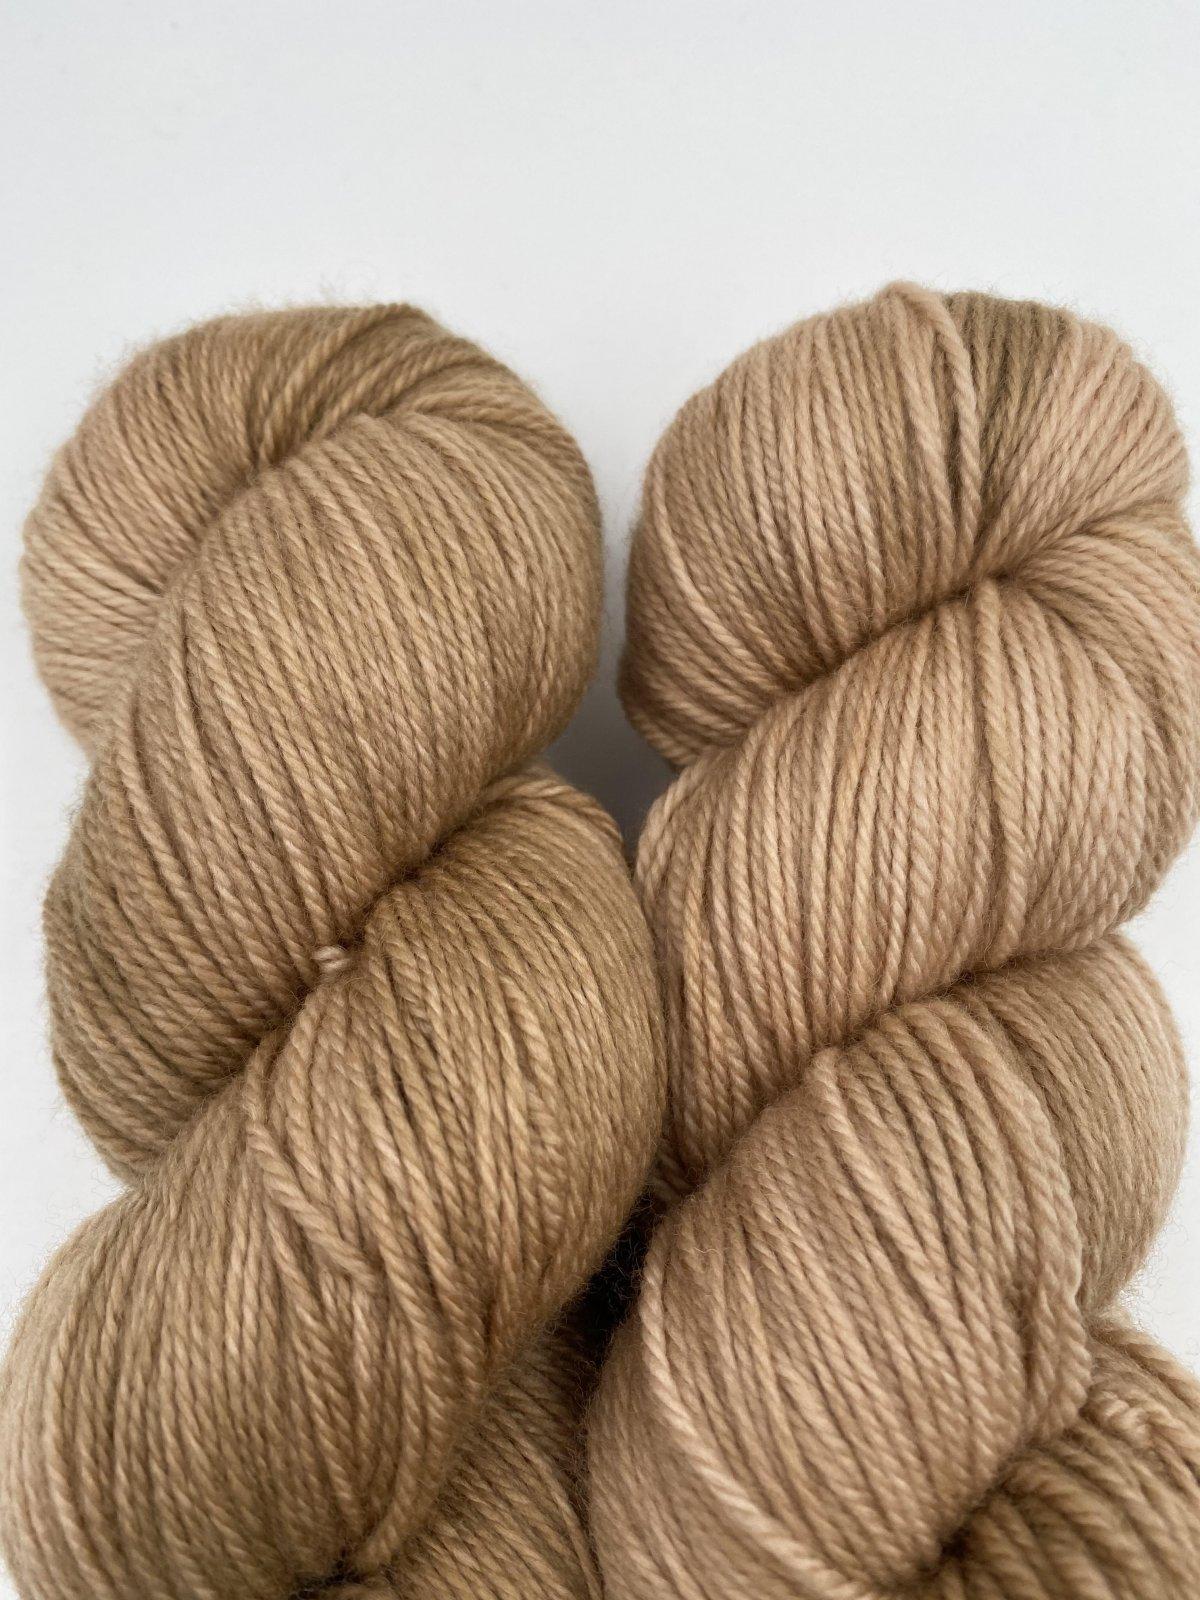 Zen Yarn Garden Binge Knit DK - Dunder Mifflin